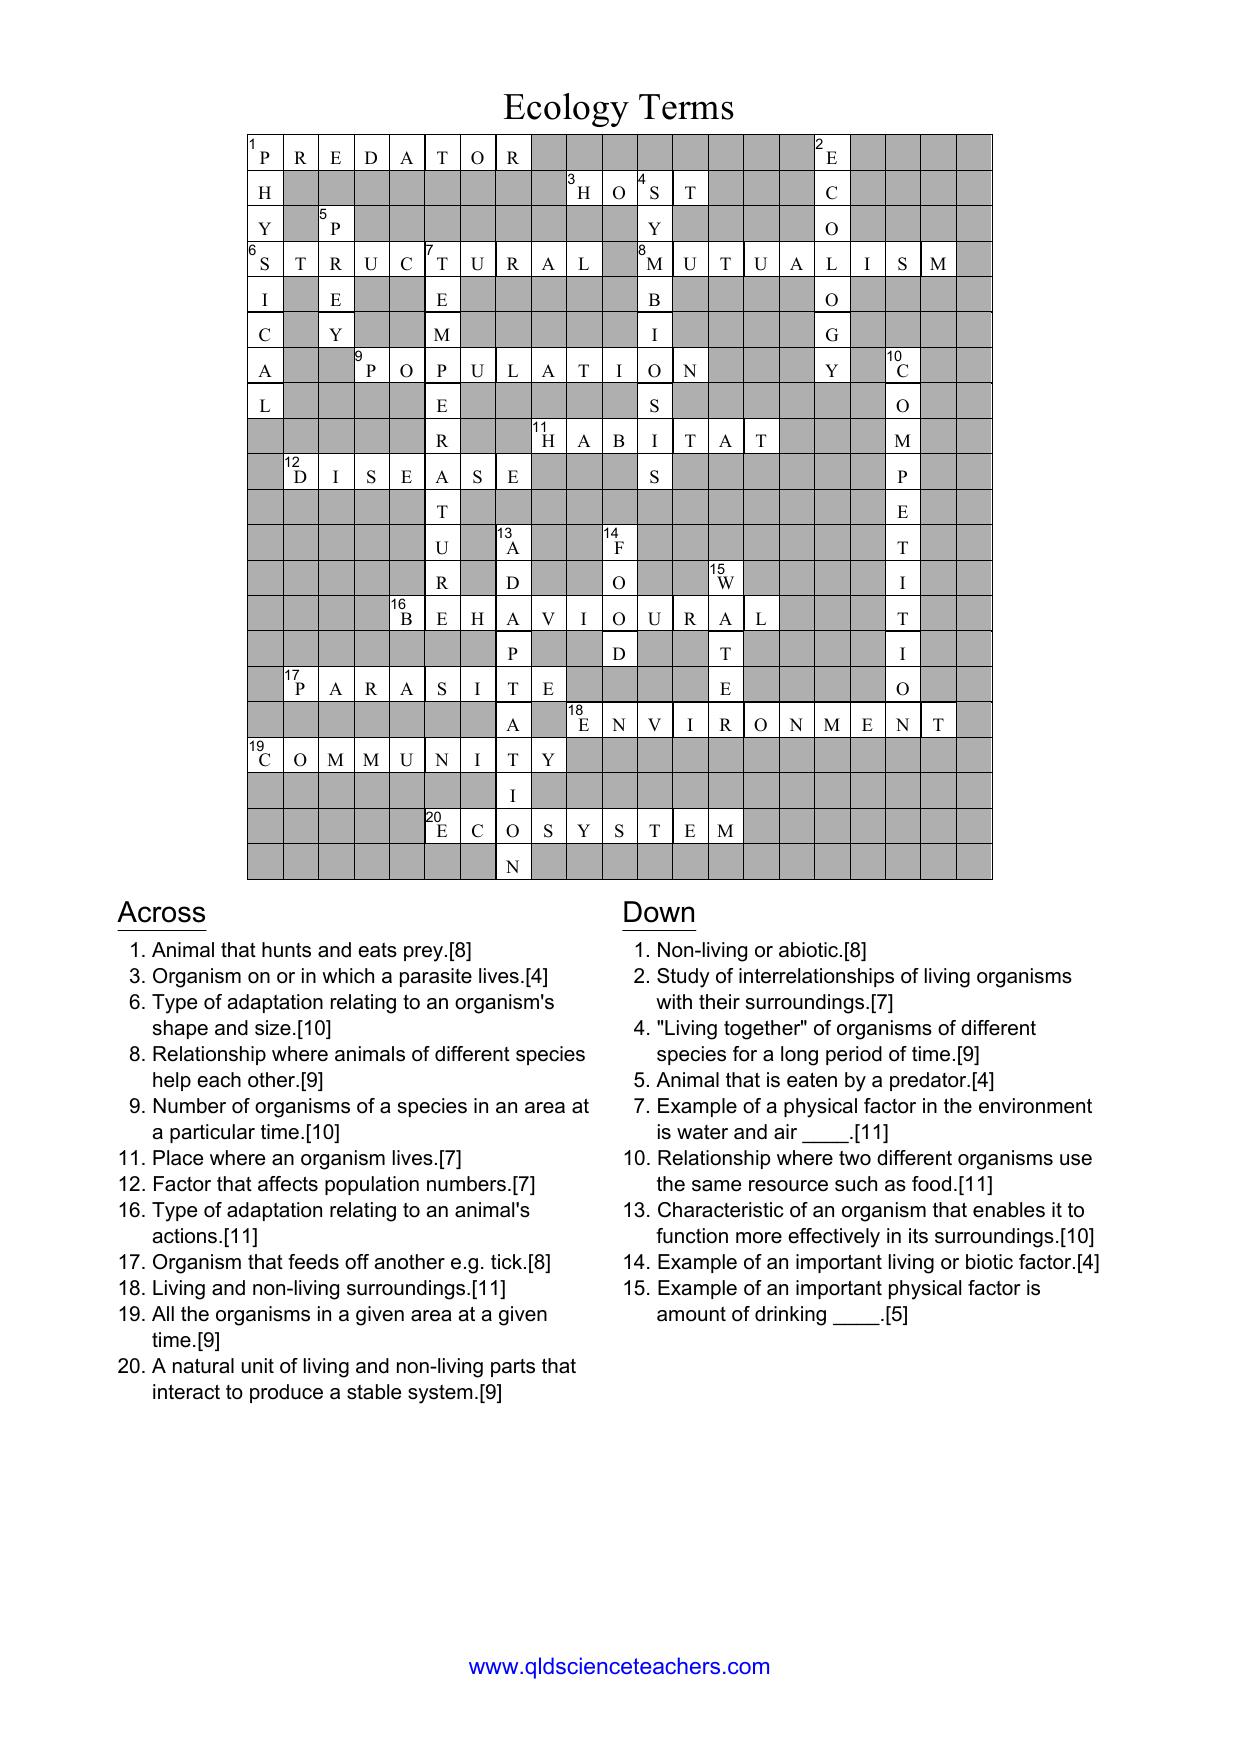 Ecology Crossword Answers - Queensland Science Teachers